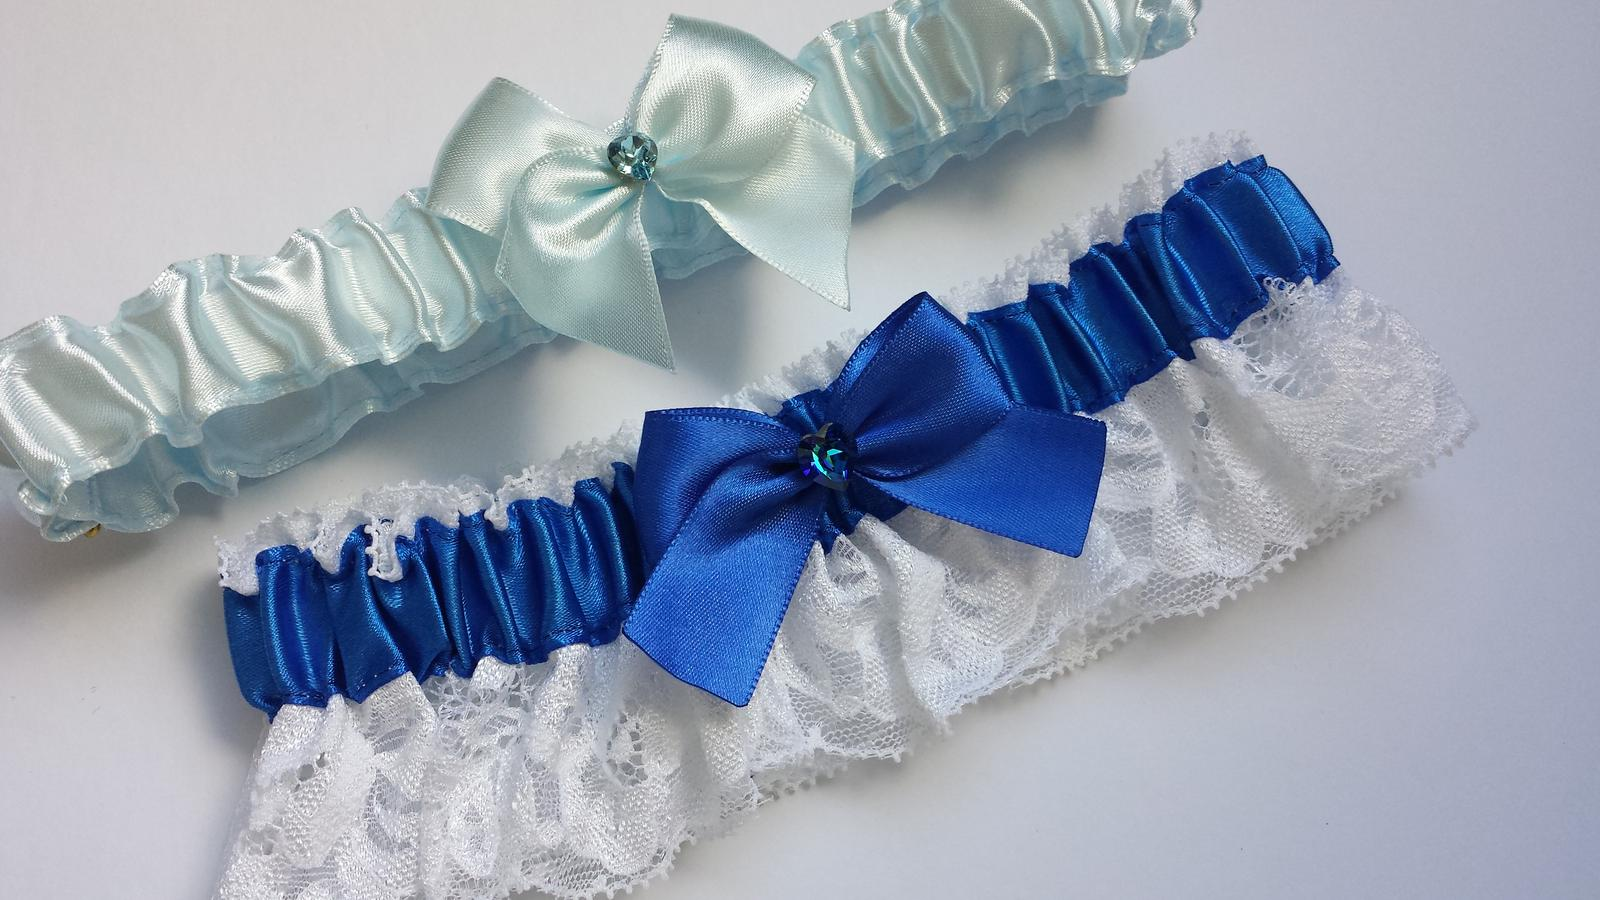 Sada  bílo/modrých SW podvazků - Obrázek č. 2